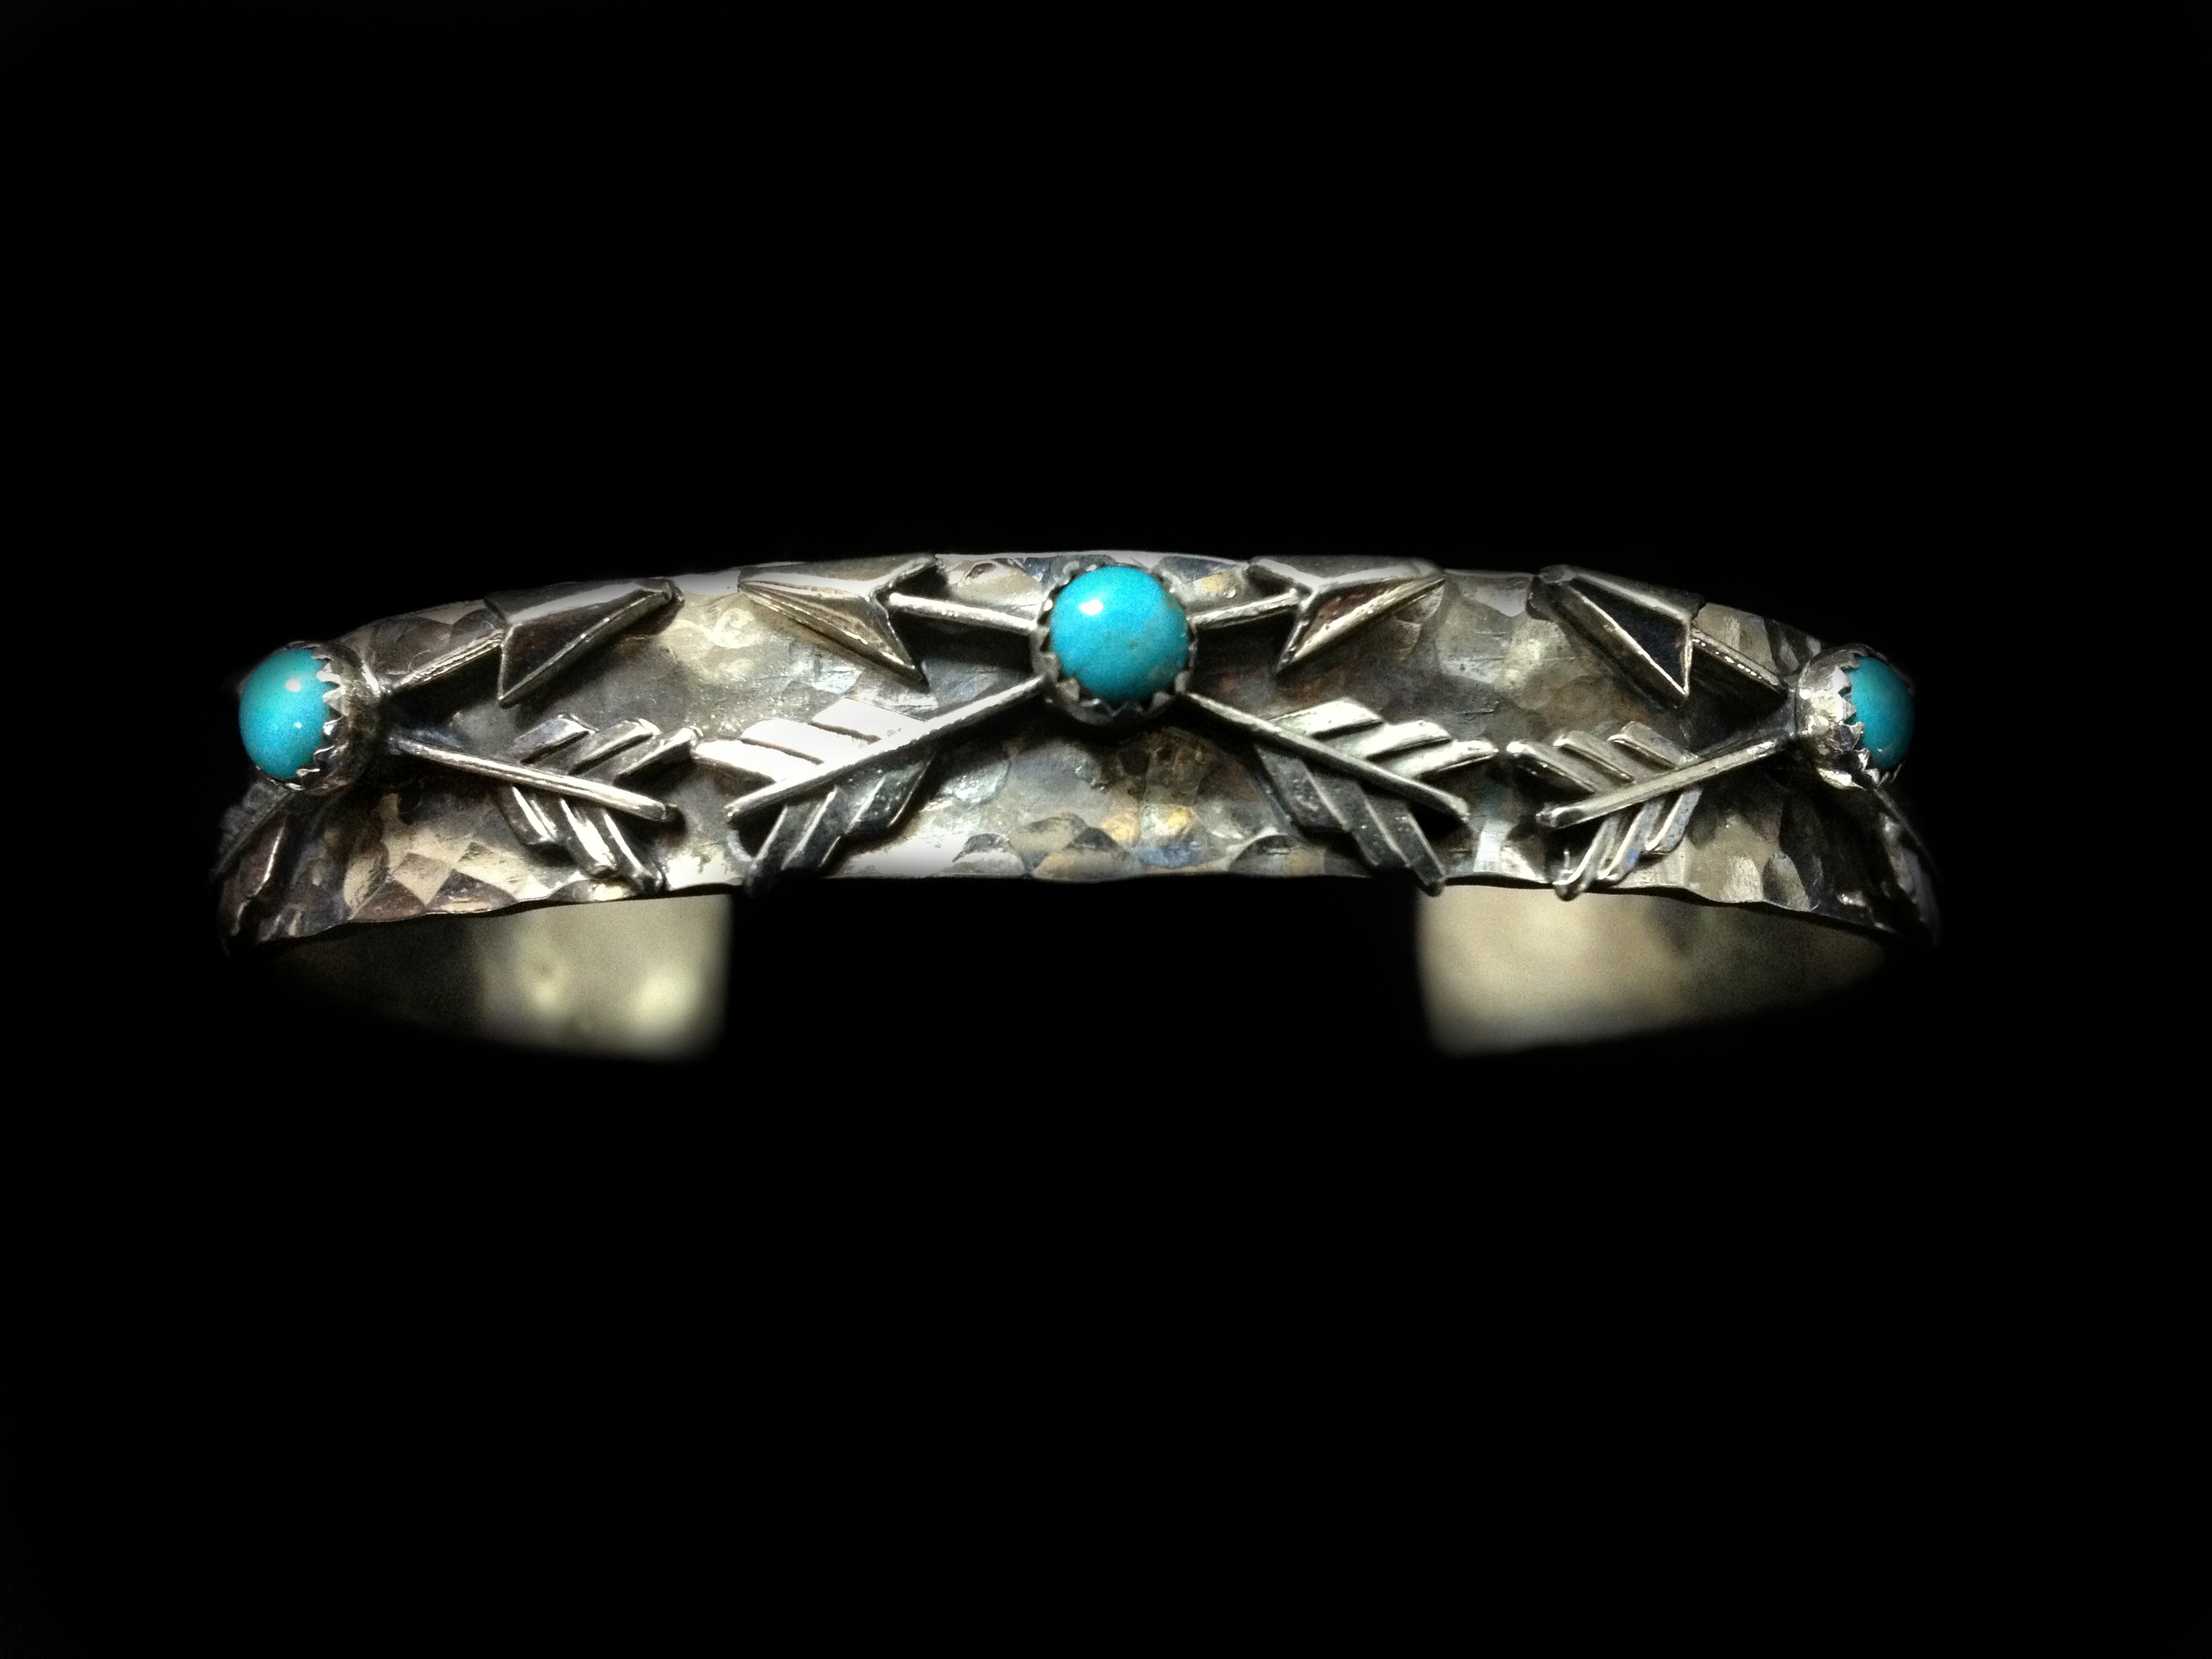 richard schmidt jewelry design crossed arrows cuff